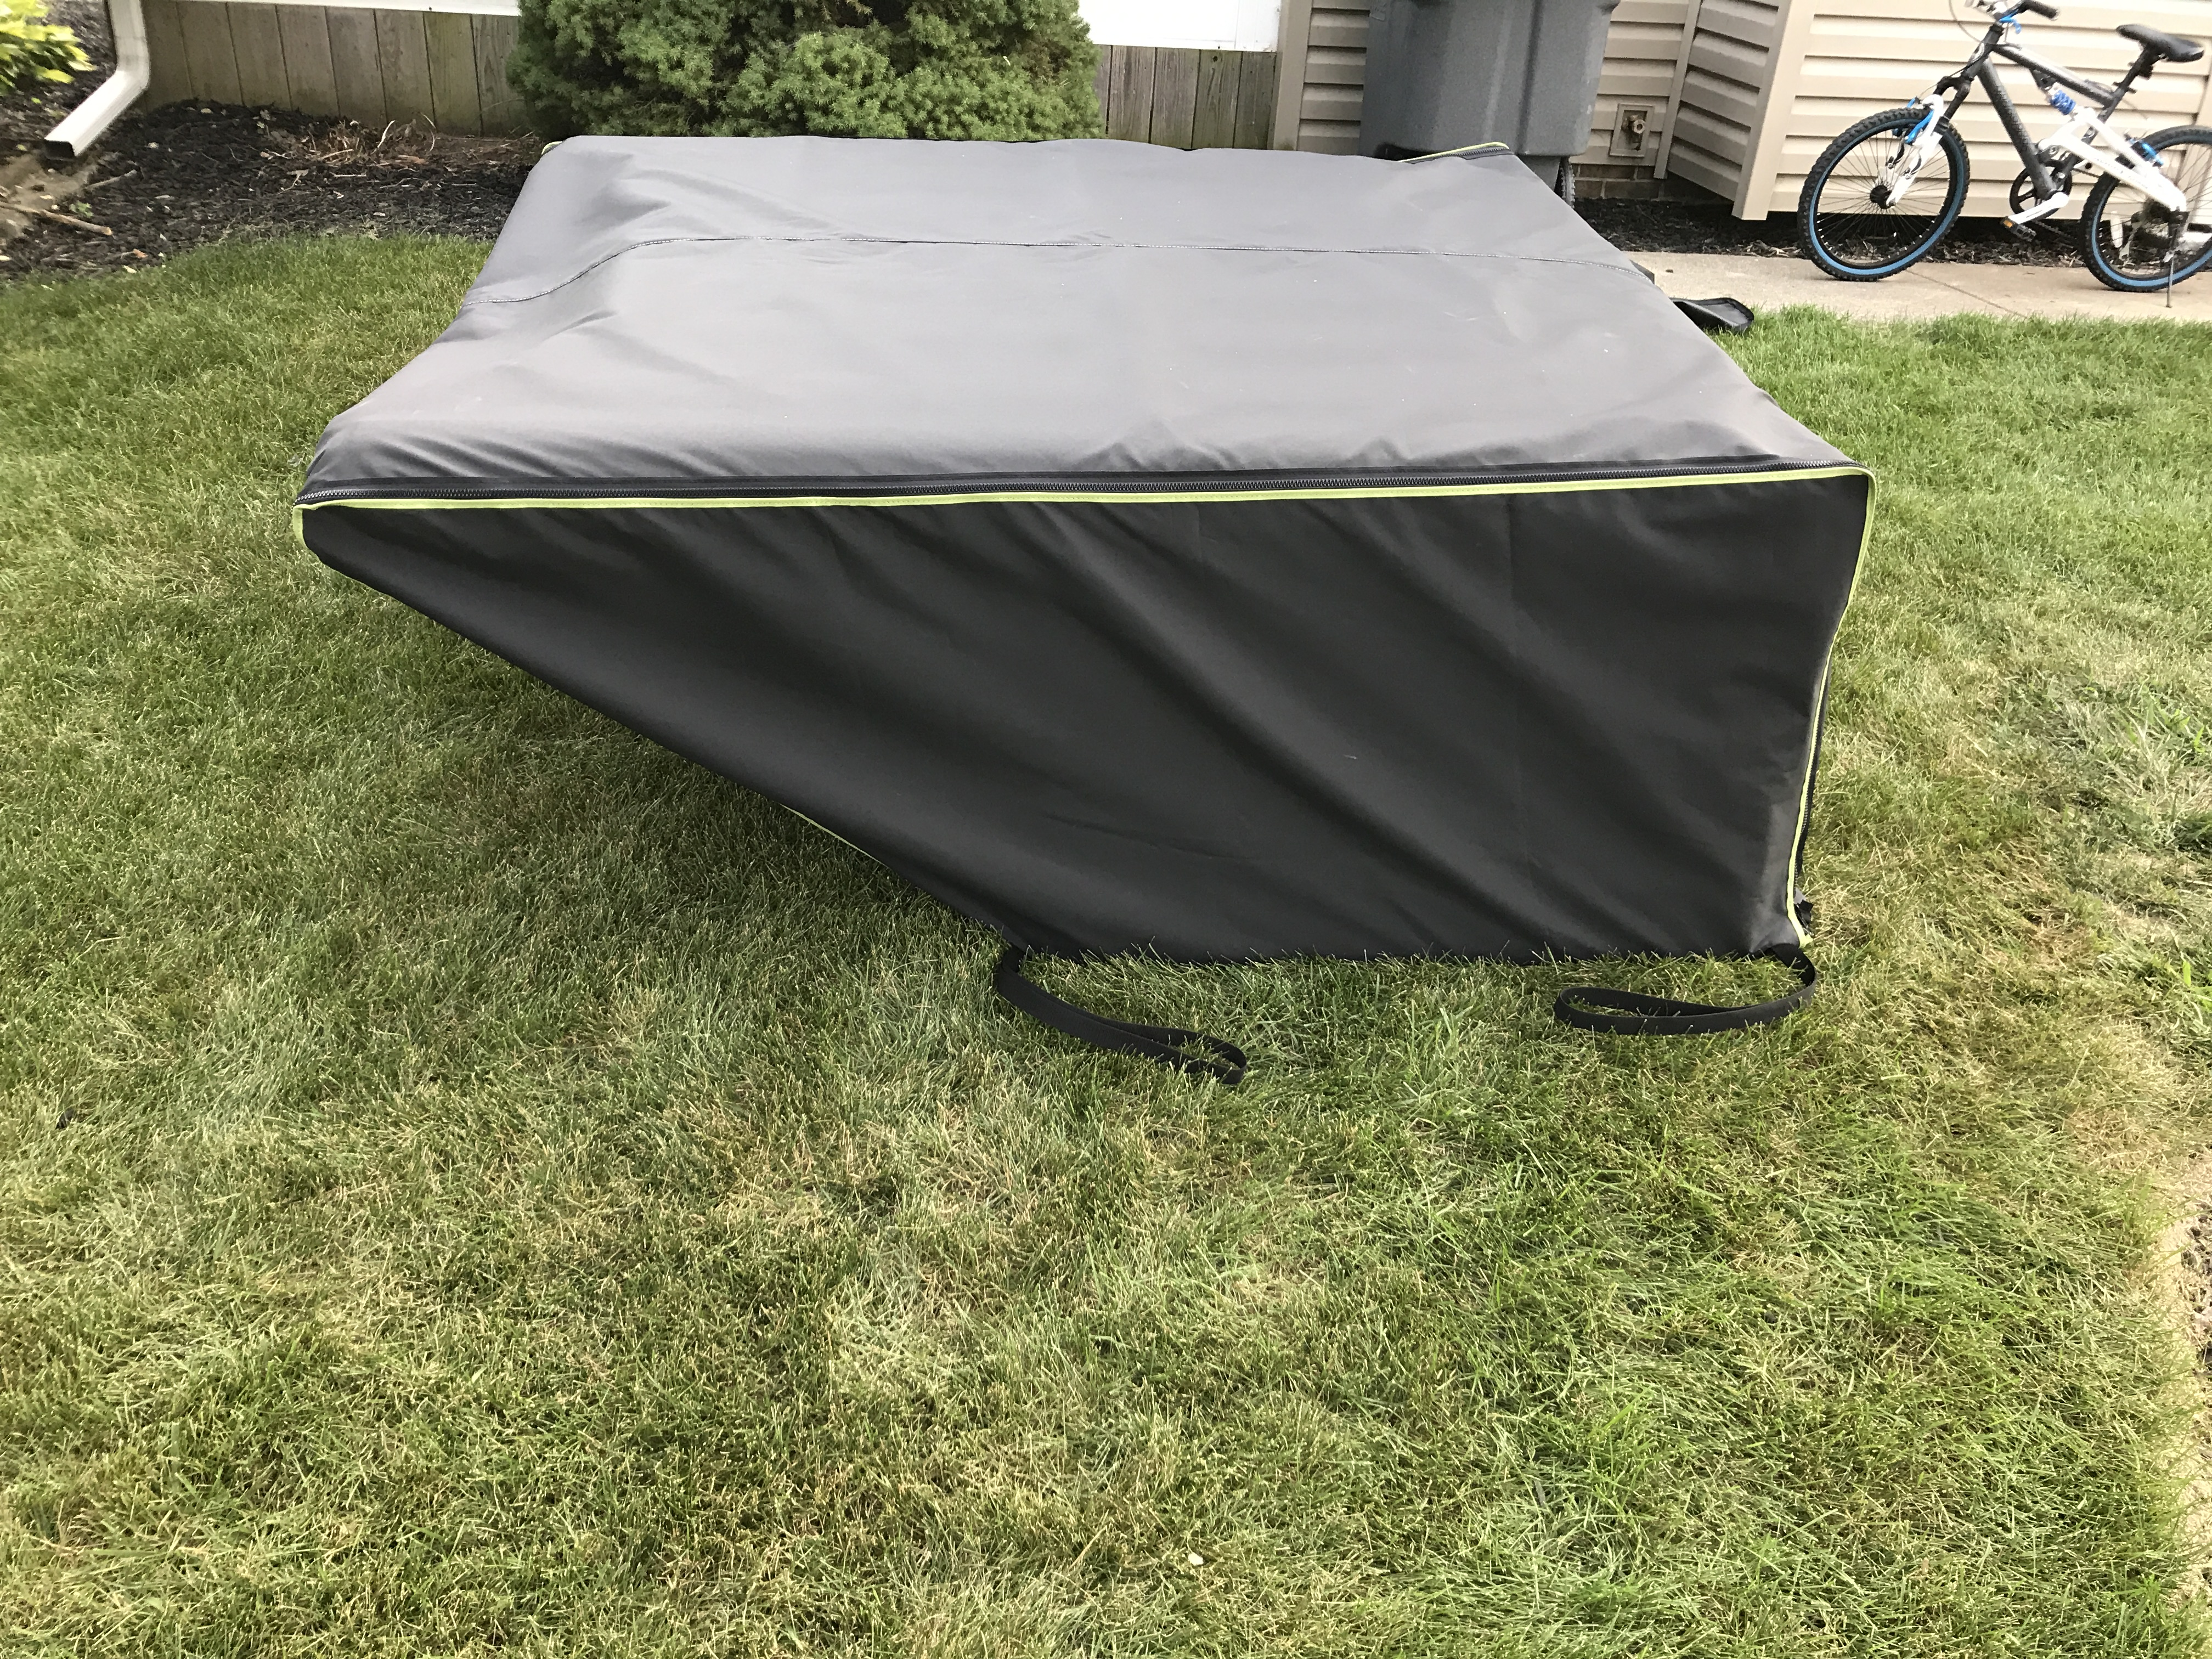 Jeep Wrangler Hardtop Storage Bag